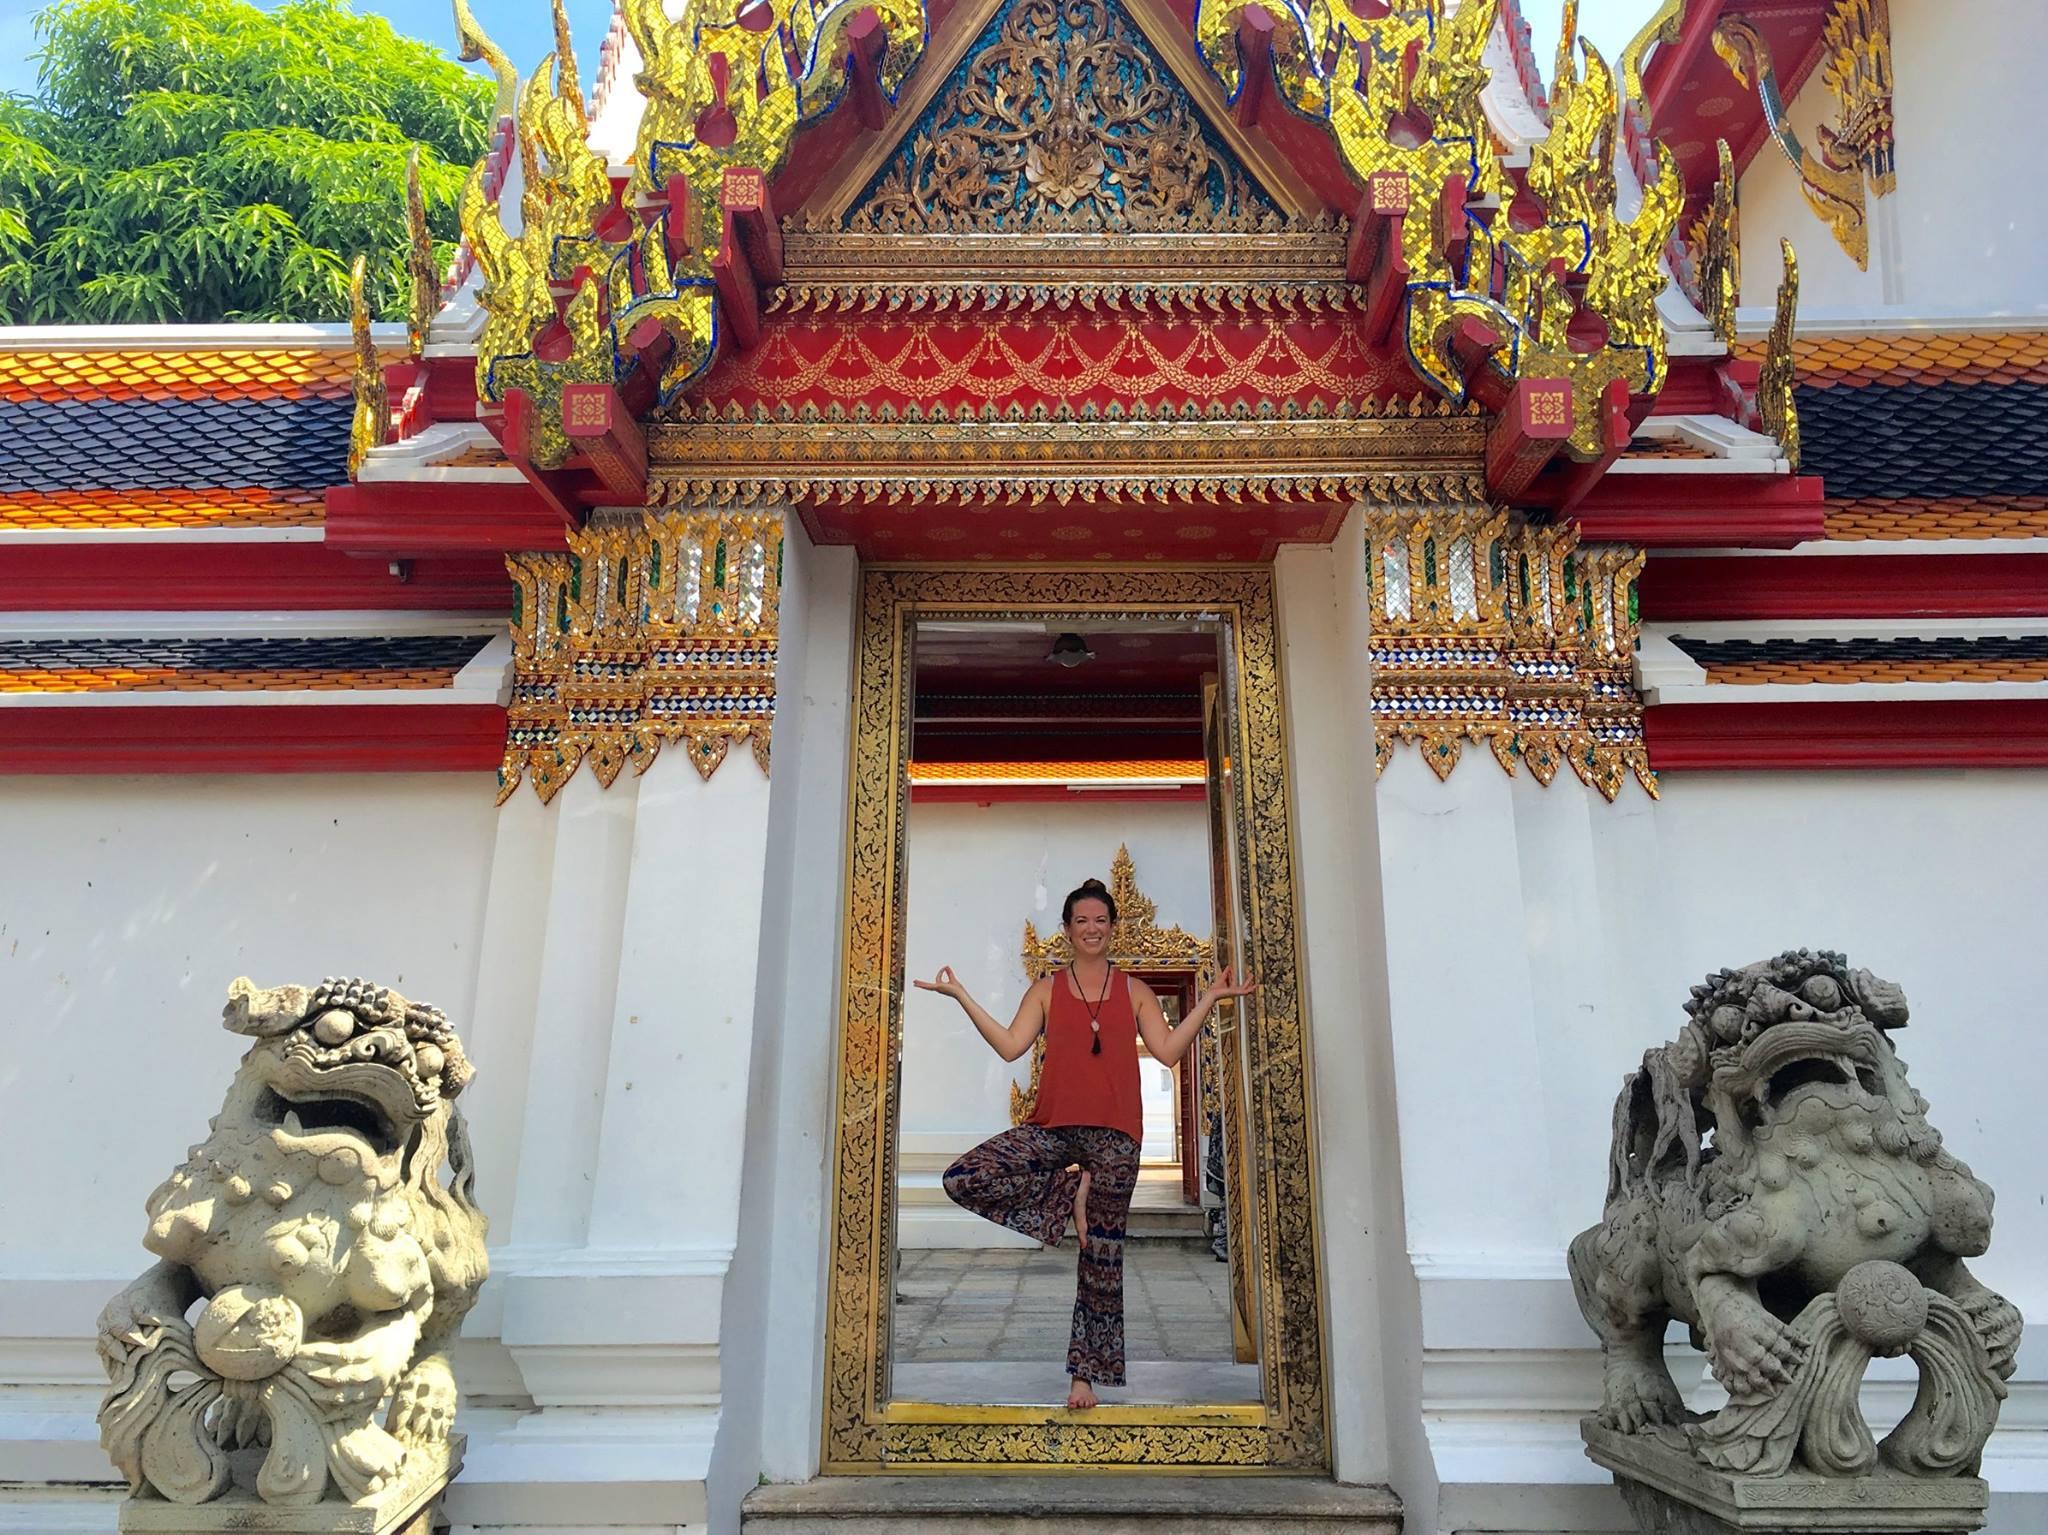 Exploring Bangkok before heading to the Chiang Mai province to teach yoga